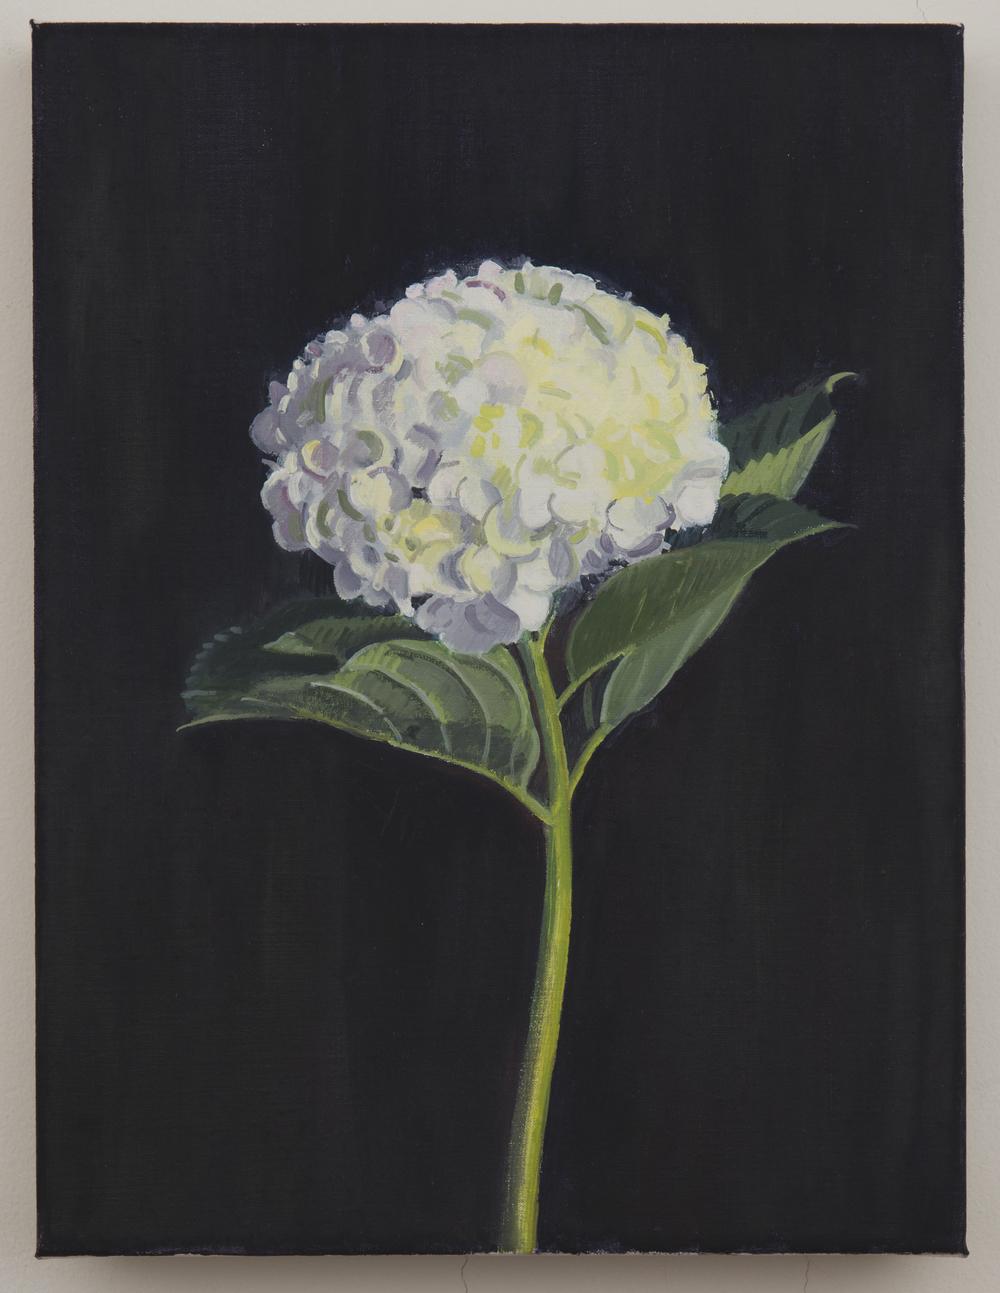 Garden Flower, 2013, oil on linen, 16 x 12 inches